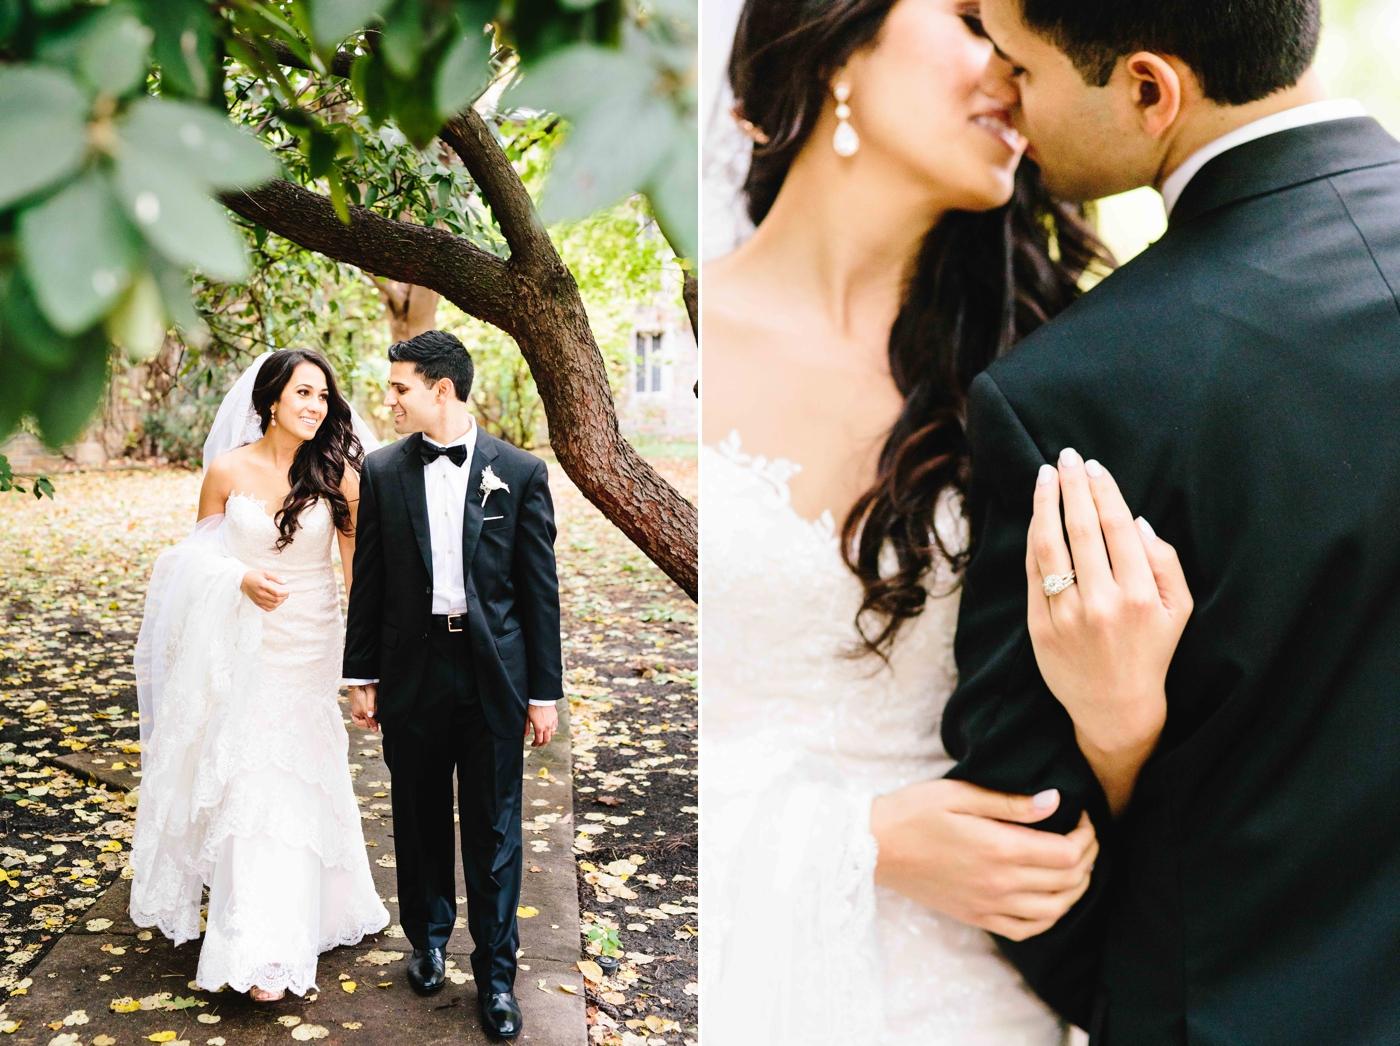 chicago-fine-art-wedding-photography-alfano15